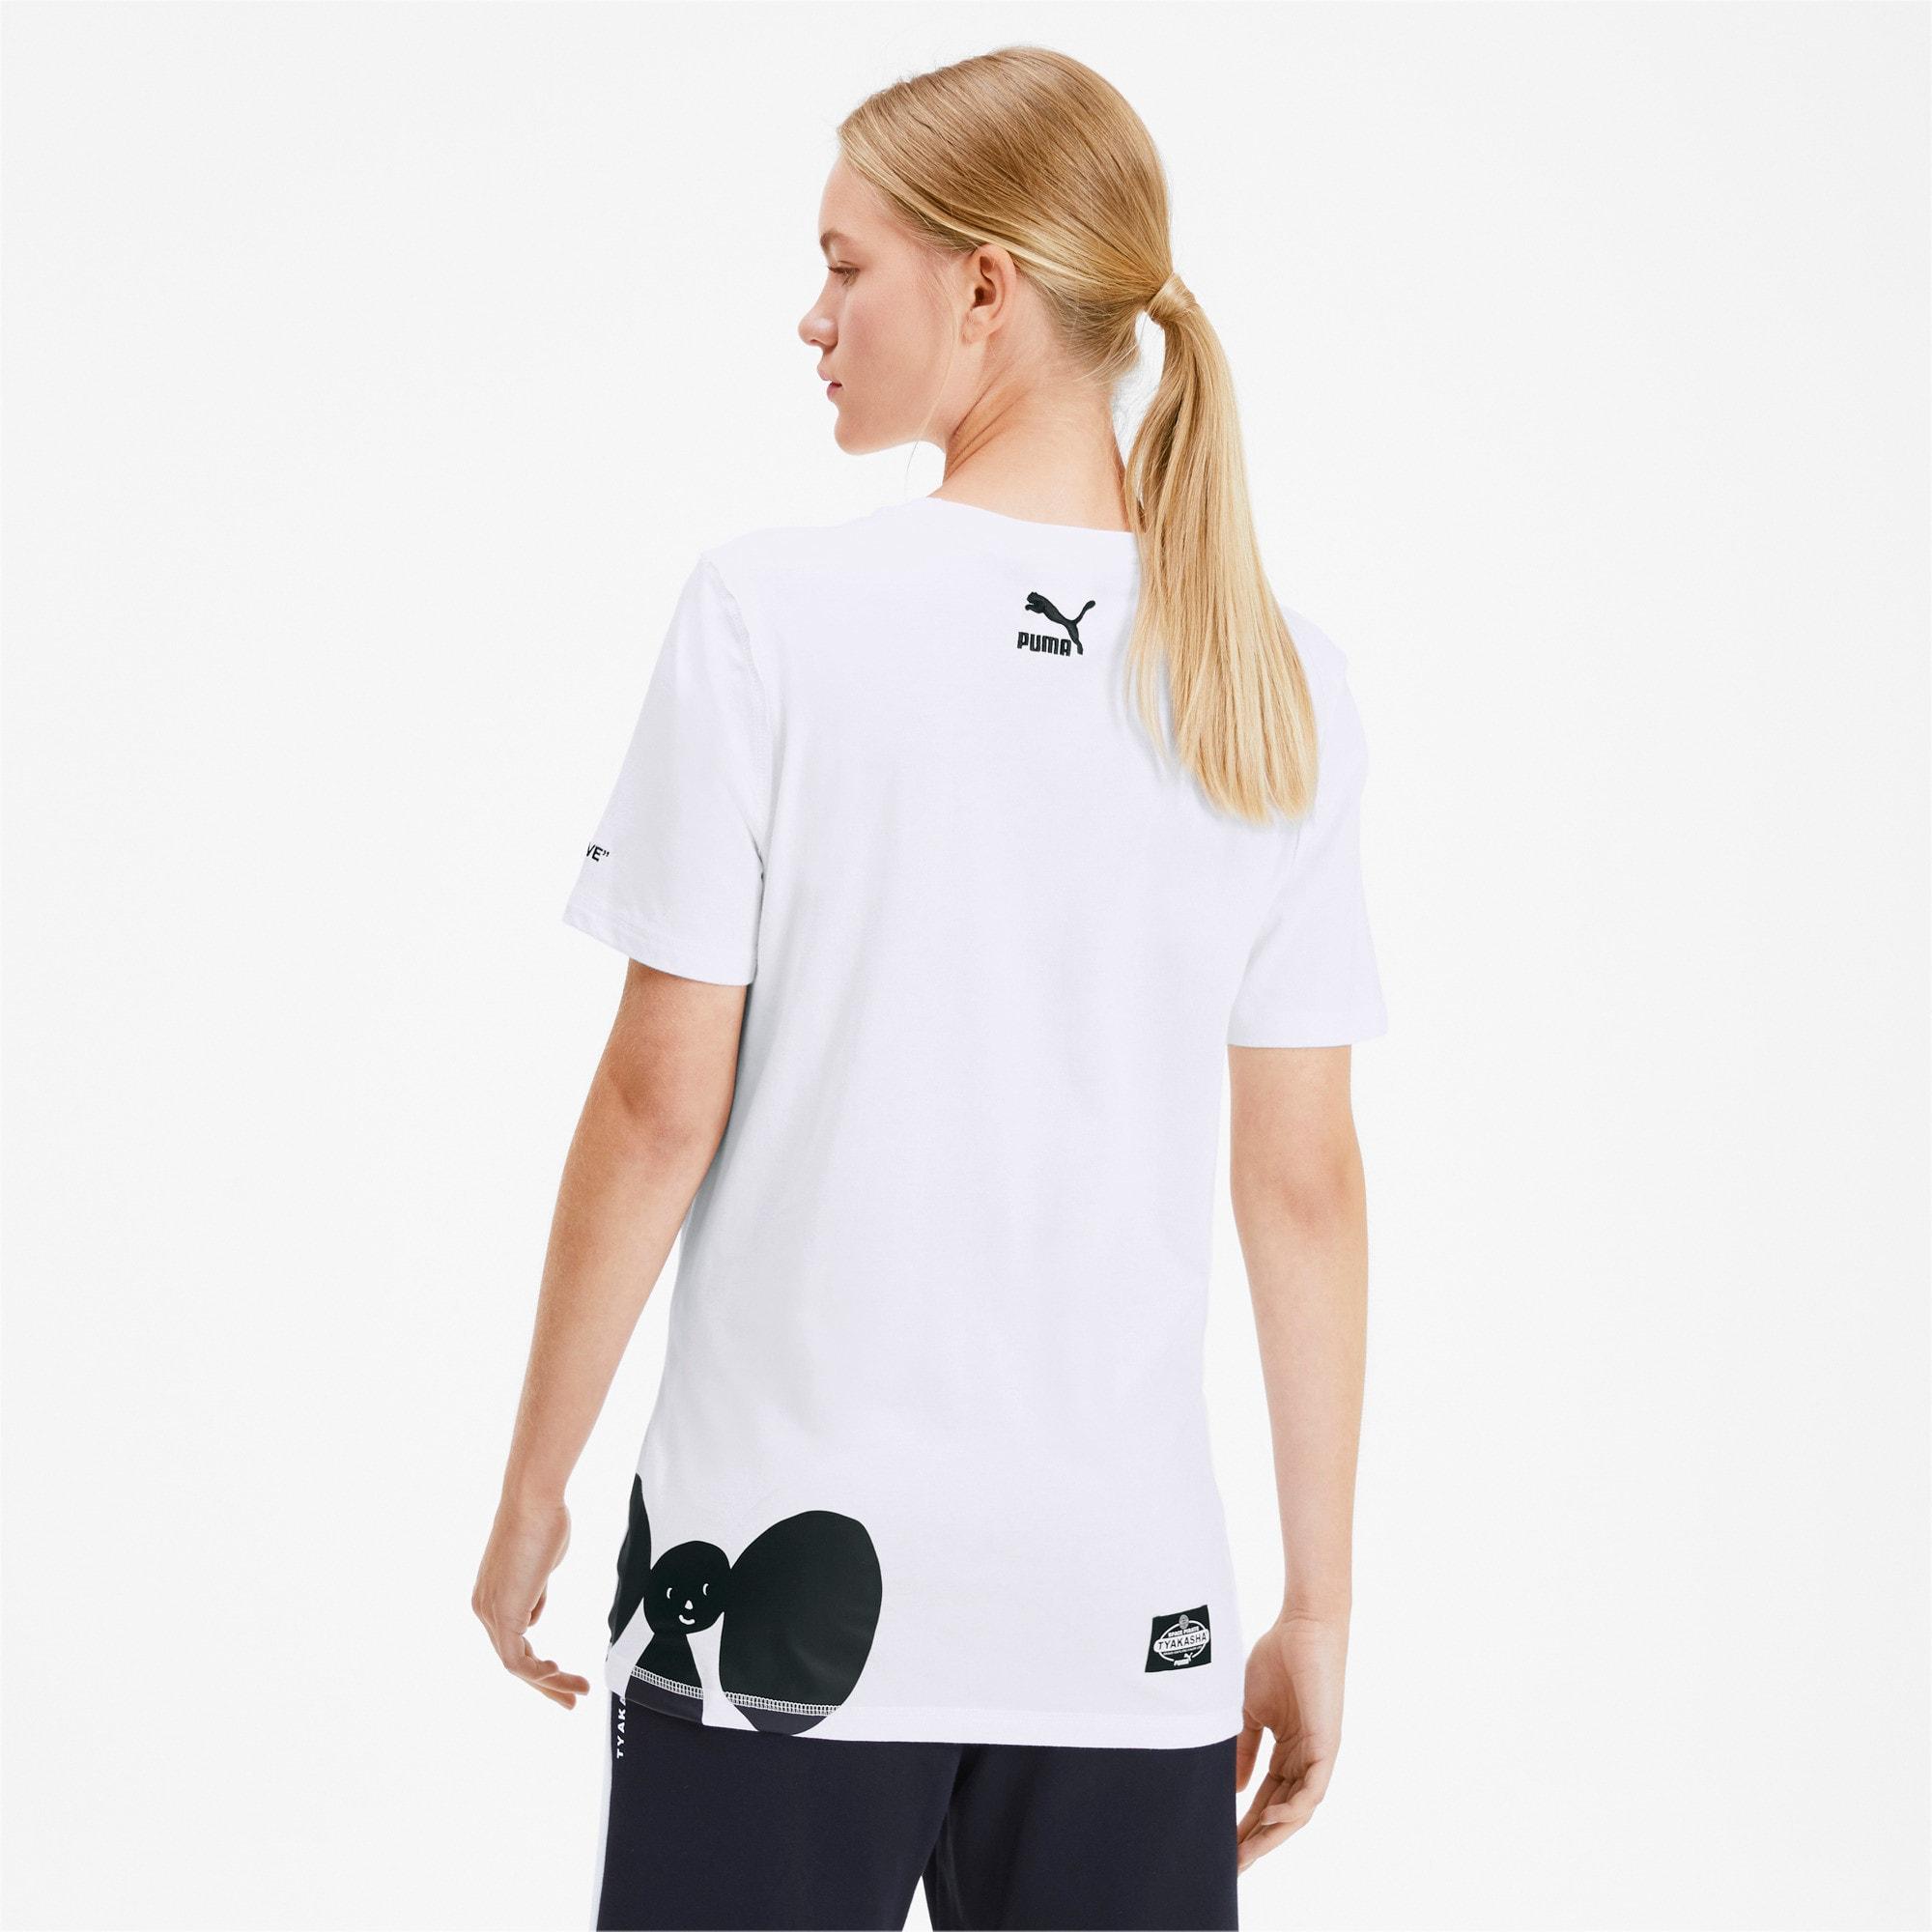 Thumbnail 3 of PUMA x TYAKASHA T-shirt, Puma White, medium